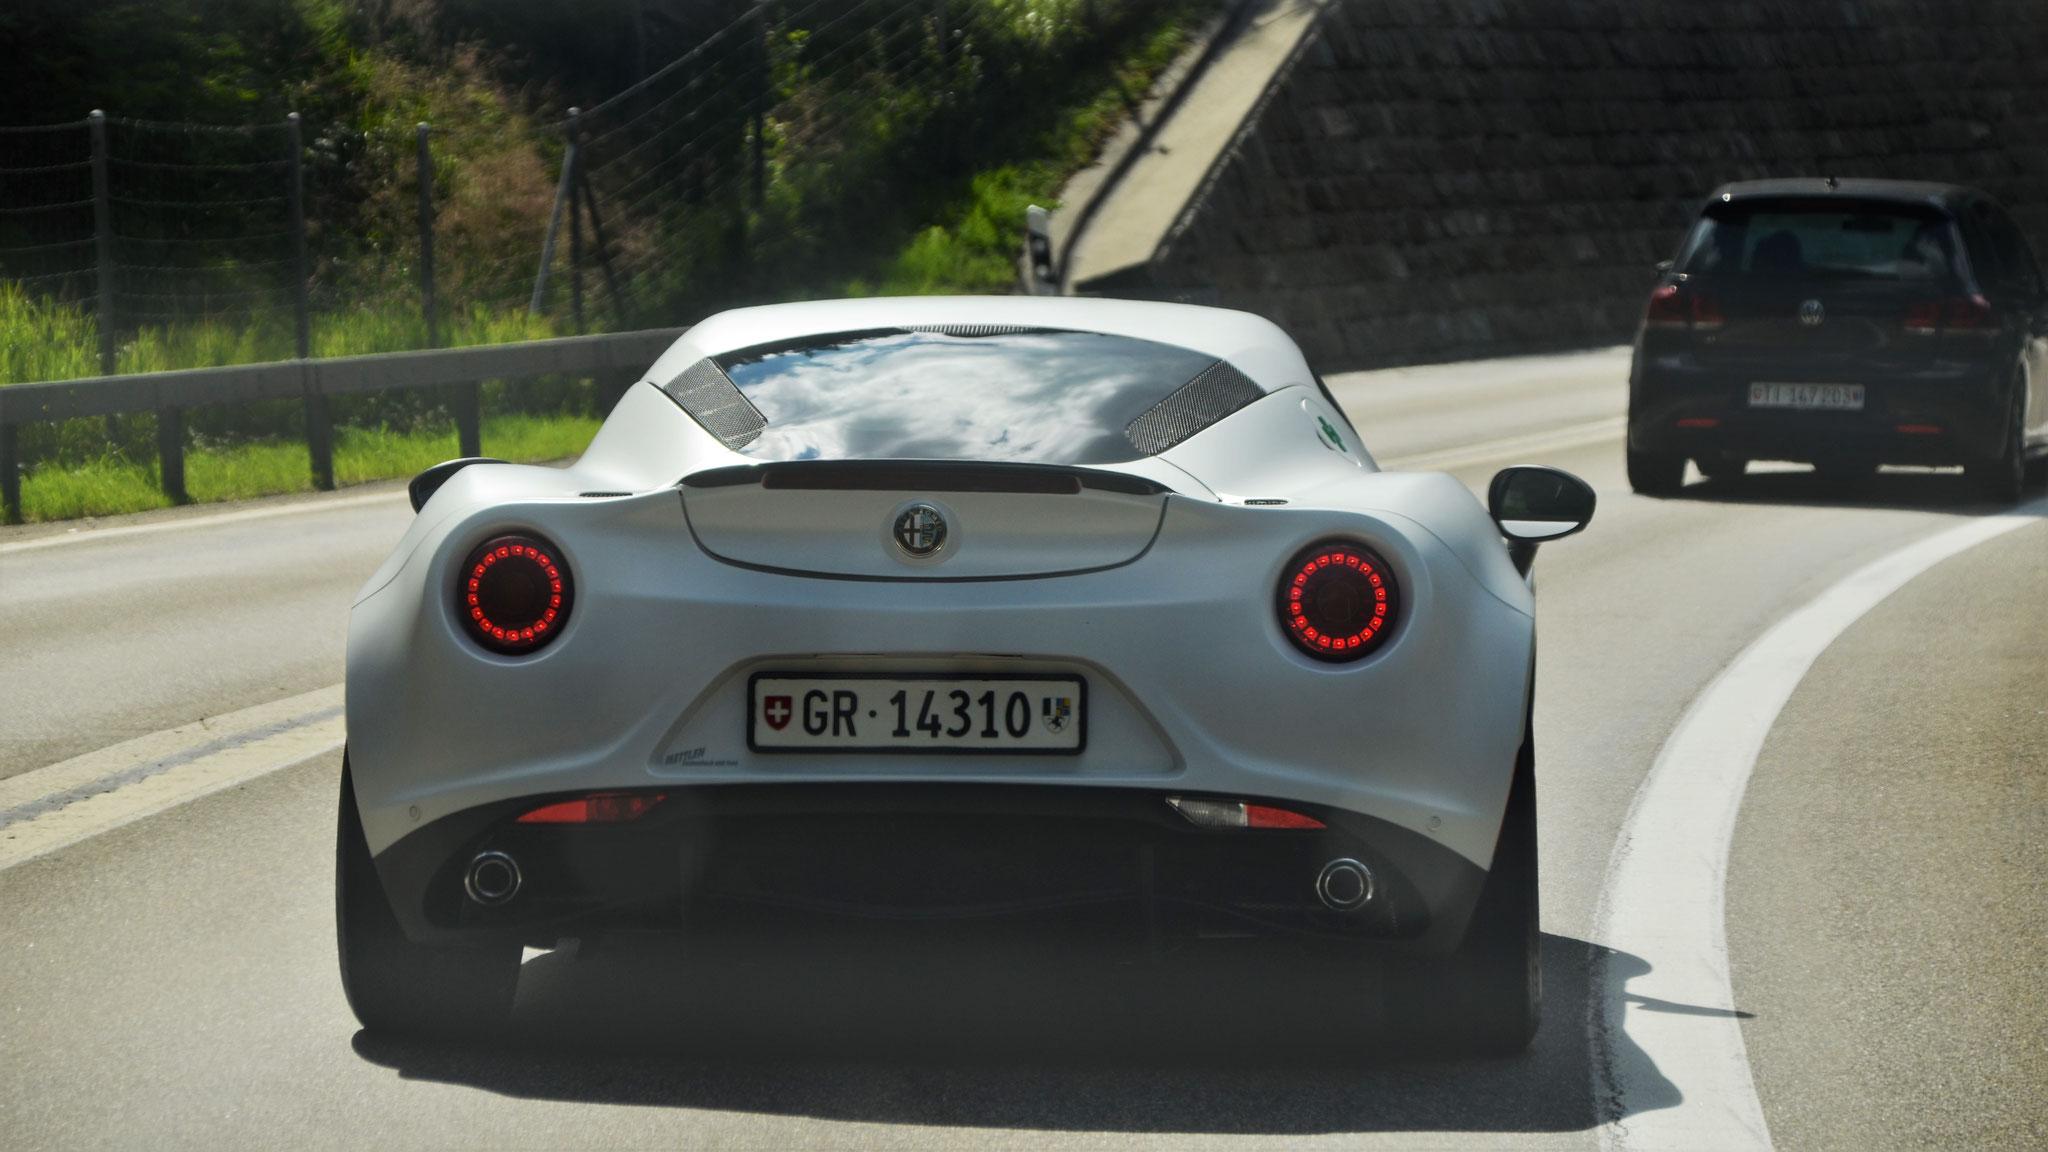 Alfa Romeo 4C - GR-14310 (CH)